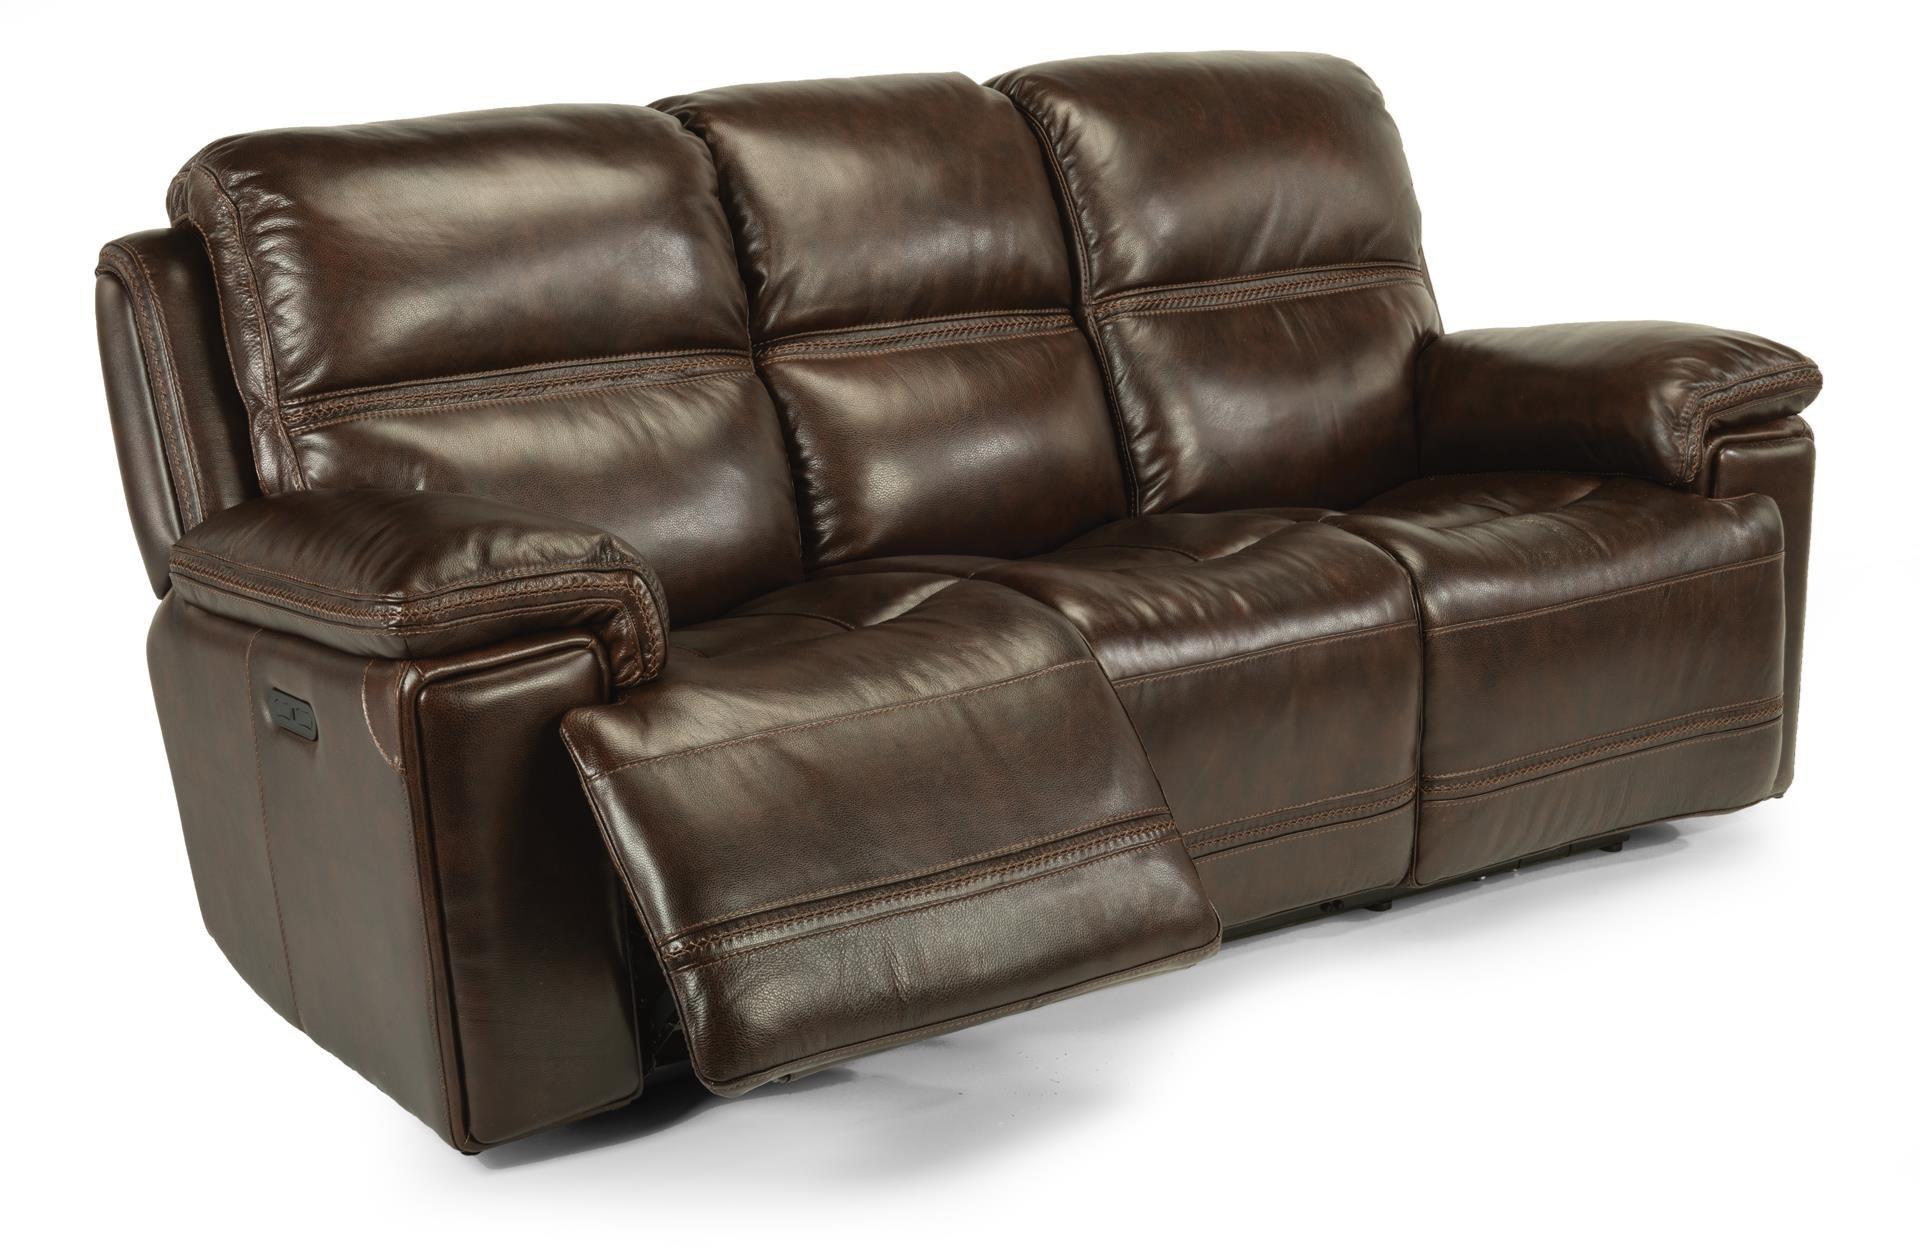 Charmant Flexsteel Latitudes FenwickLeather Power Reclining Sofa W/ Power Headre.  Read Reviews